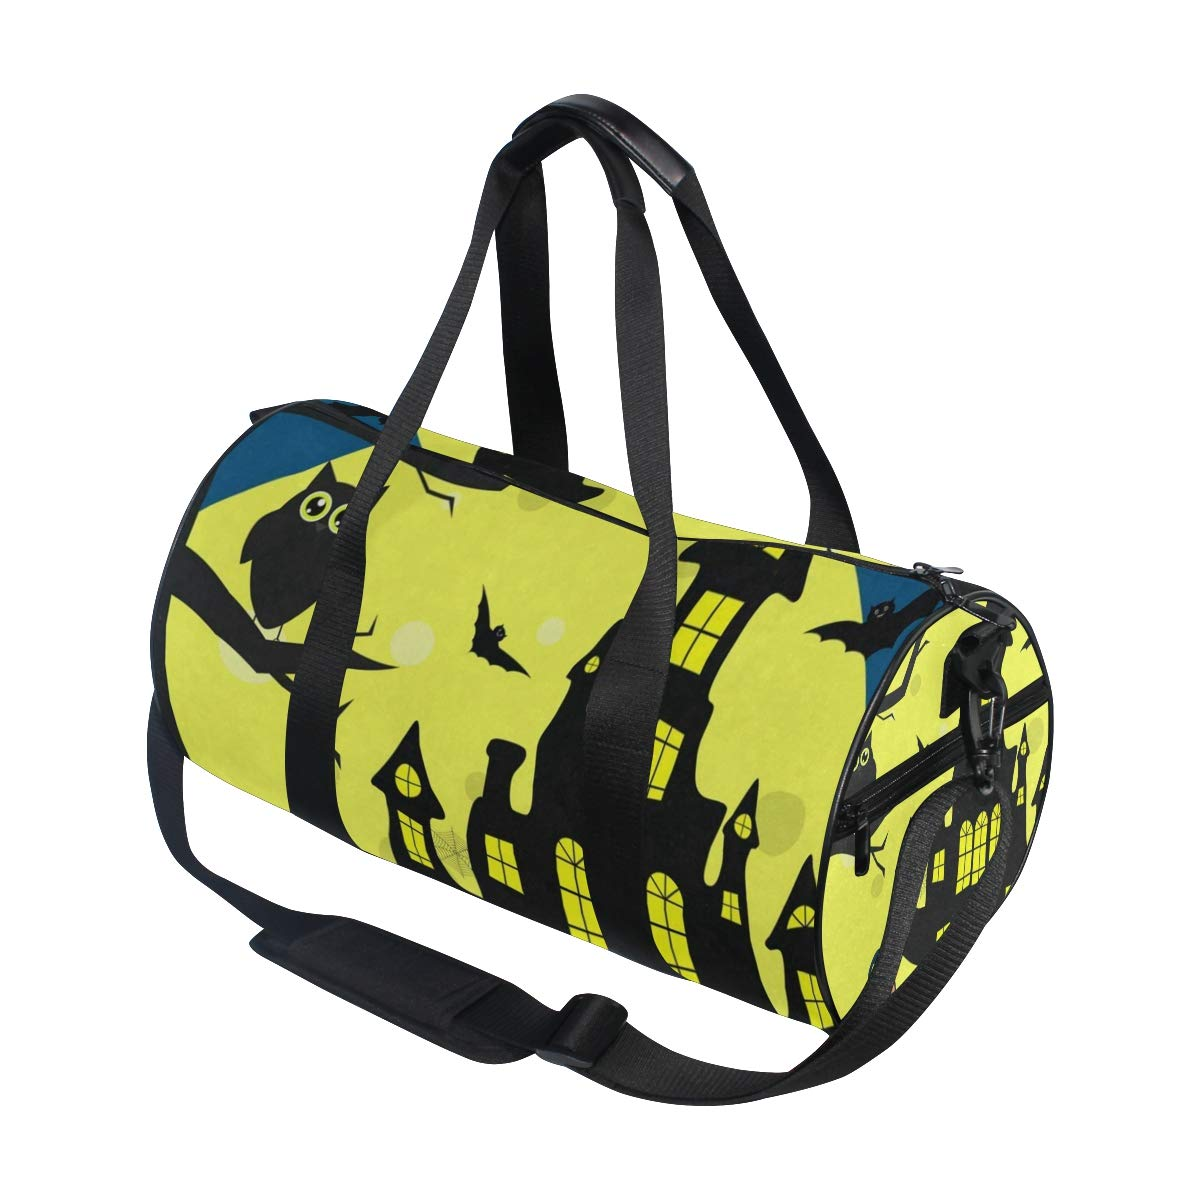 Travel Duffel Bag Sea Coast Beach Landscape Sketch Waterproof Lightweight Luggage bag for Sports Gym Vacation